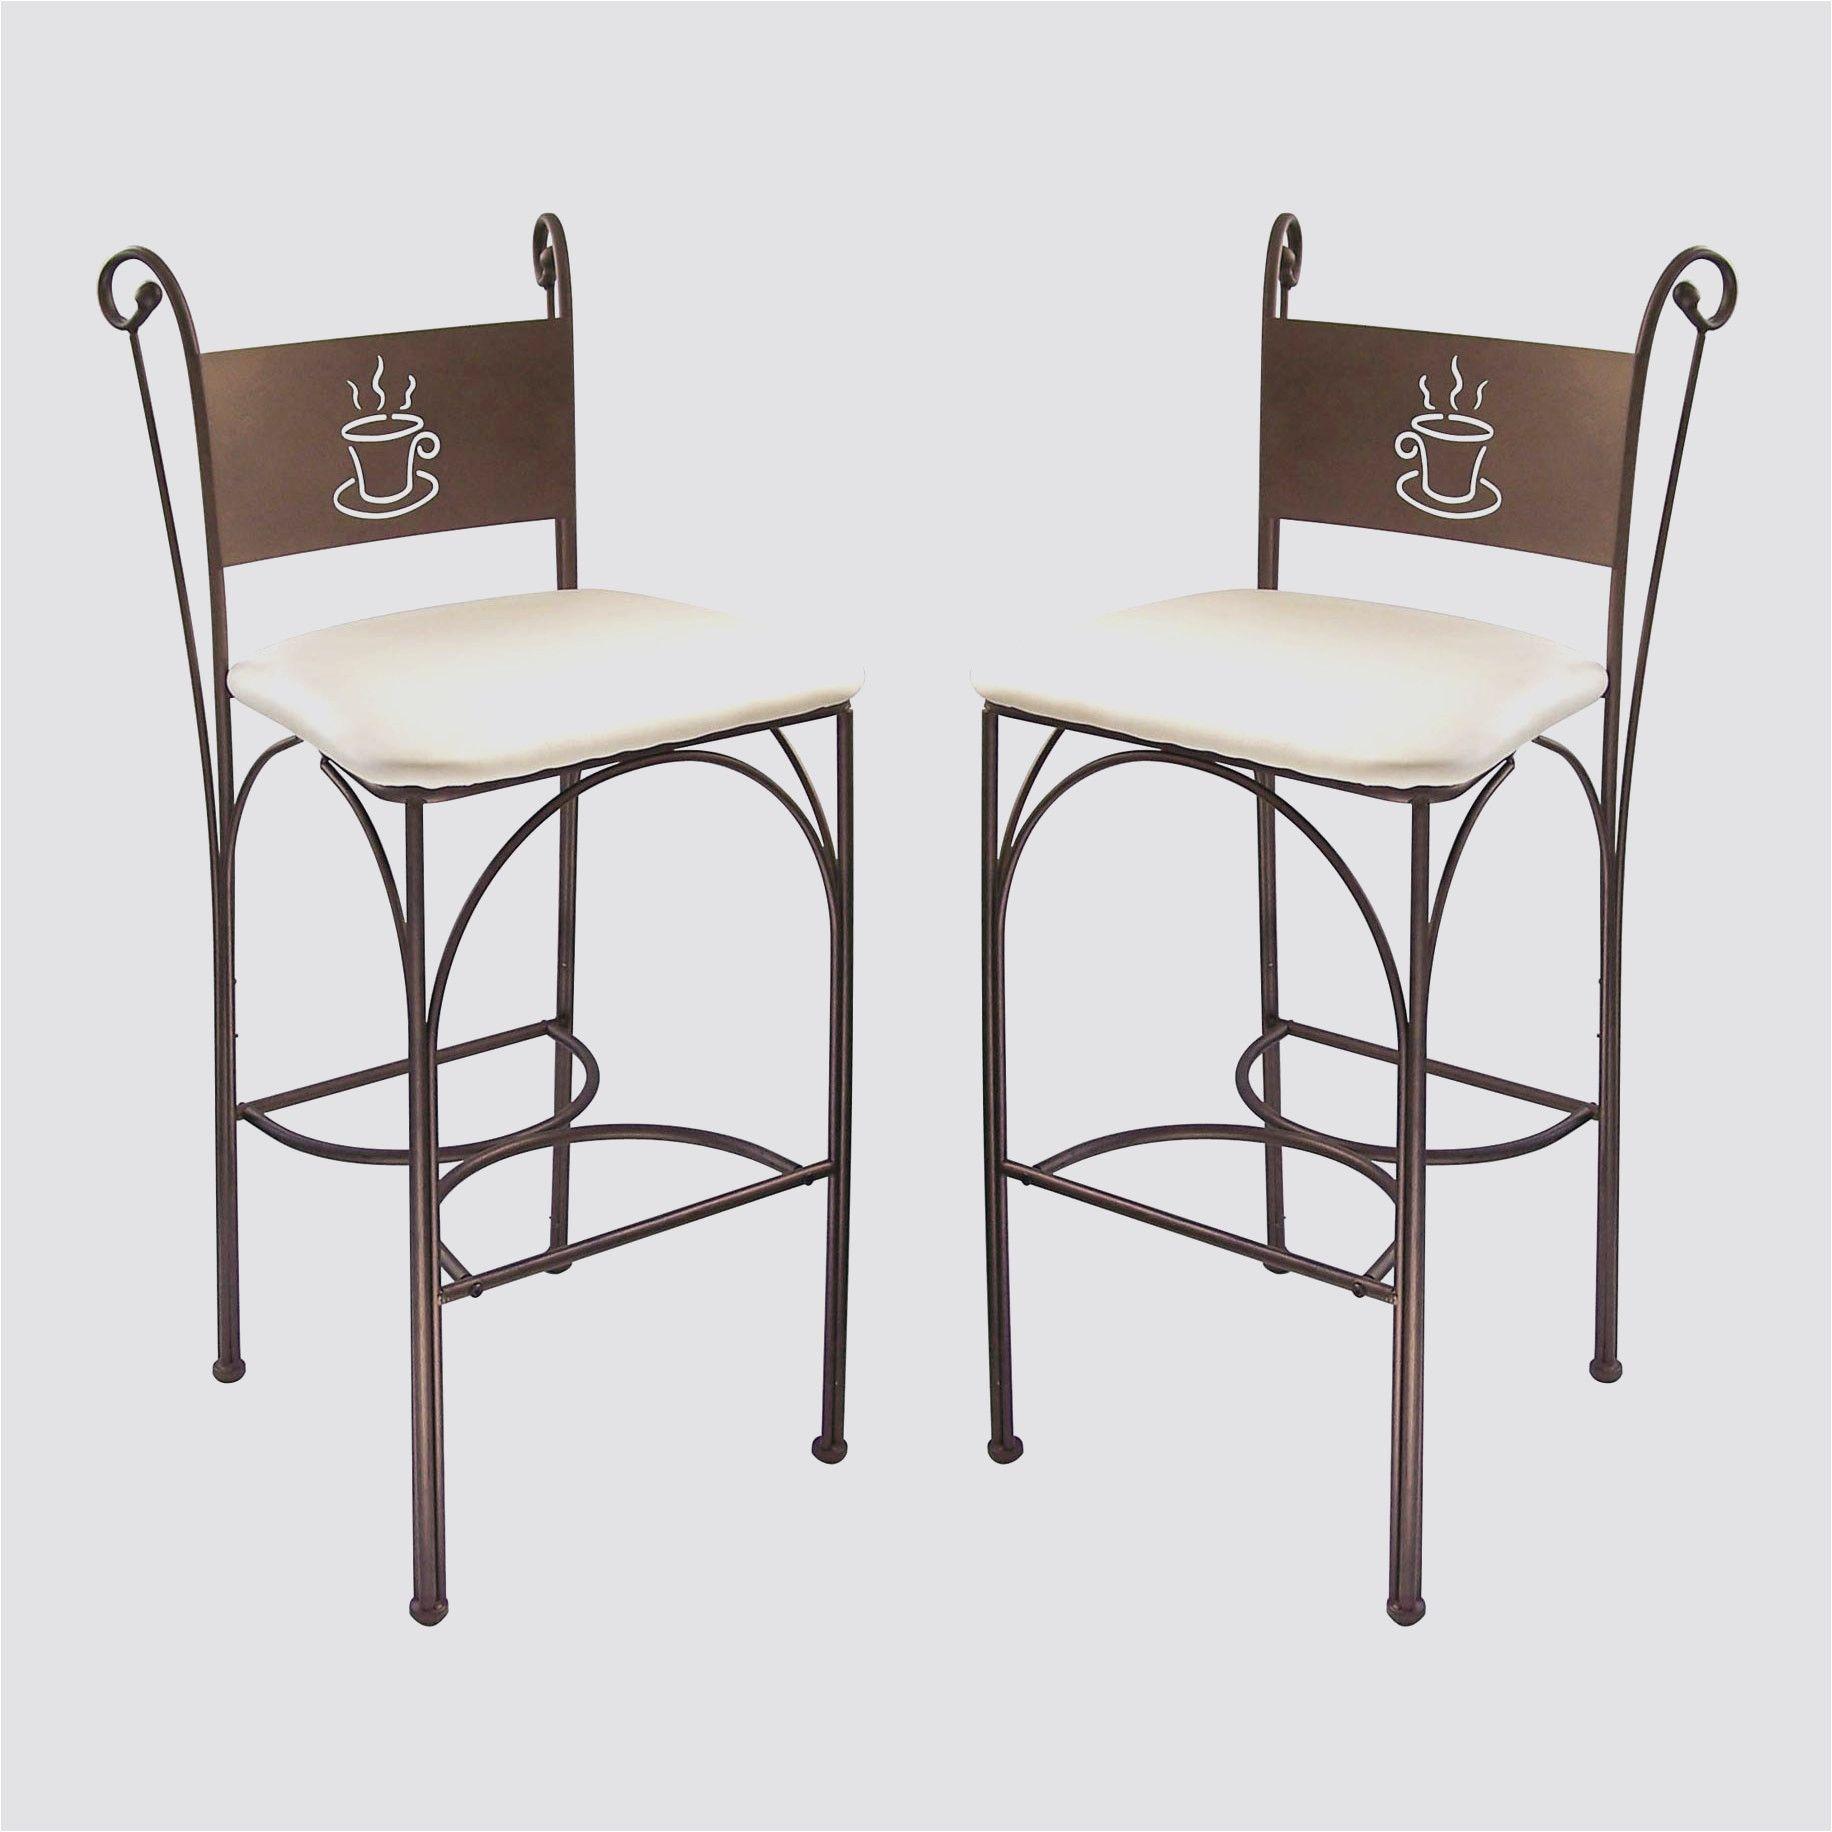 New Conforama Epagny Bar Stools Bar Table Home Decor